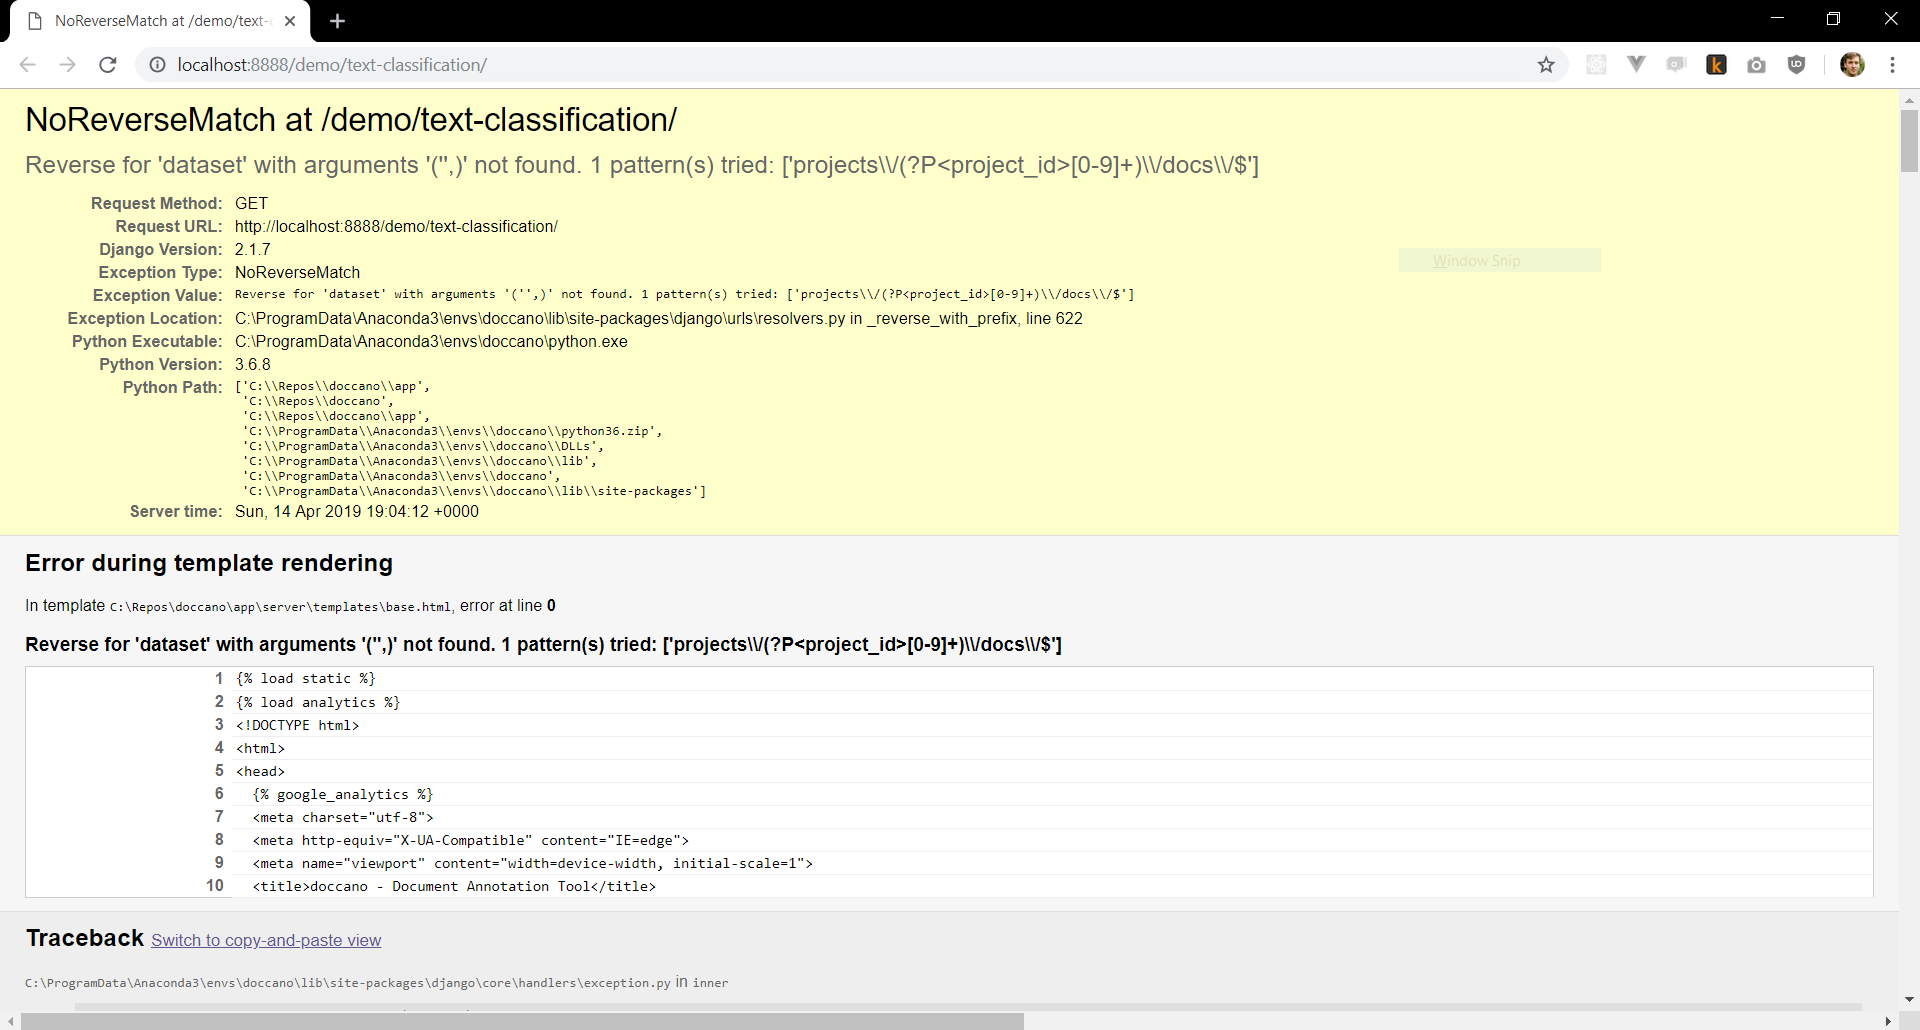 Screenshot showing NoReverseMatch crash